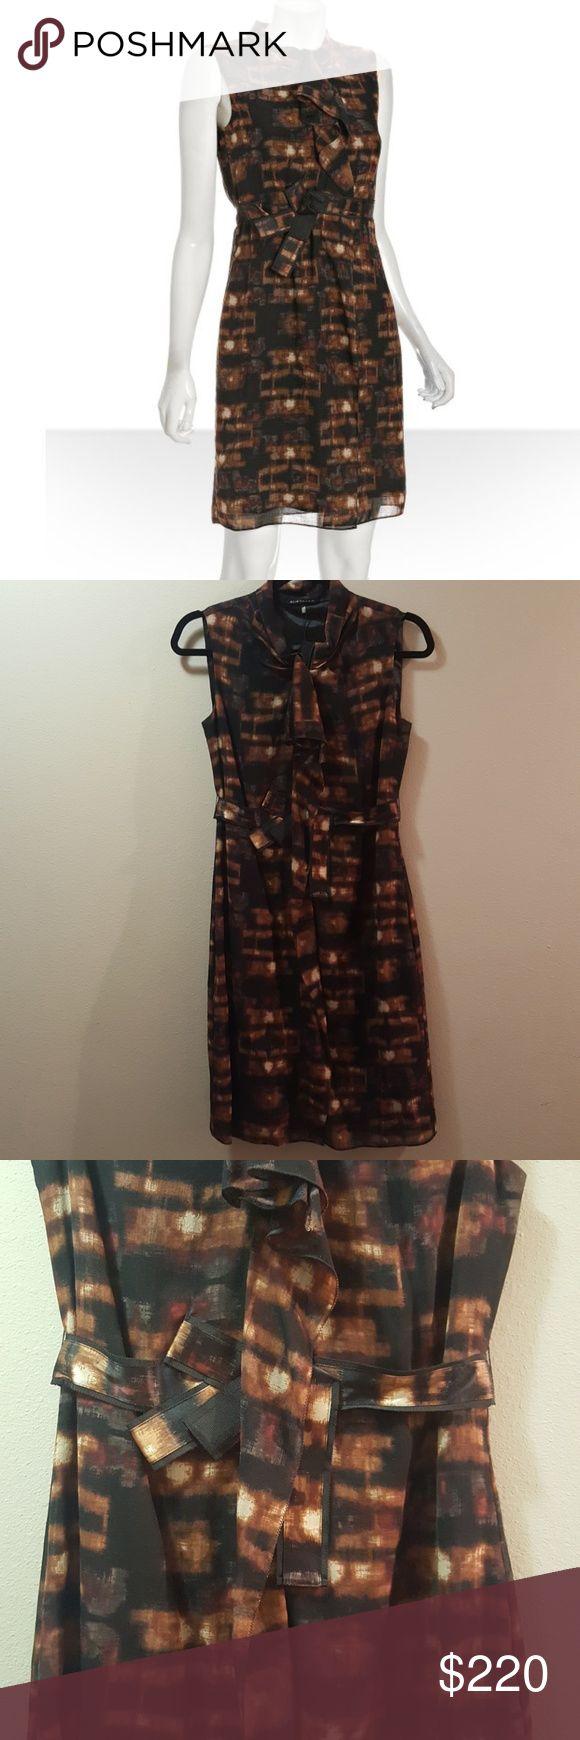 Elie Tahari Dress New Elie Tahari Mika dress. Black/copper color. zipper in front of dress Elie Tahari Dresses